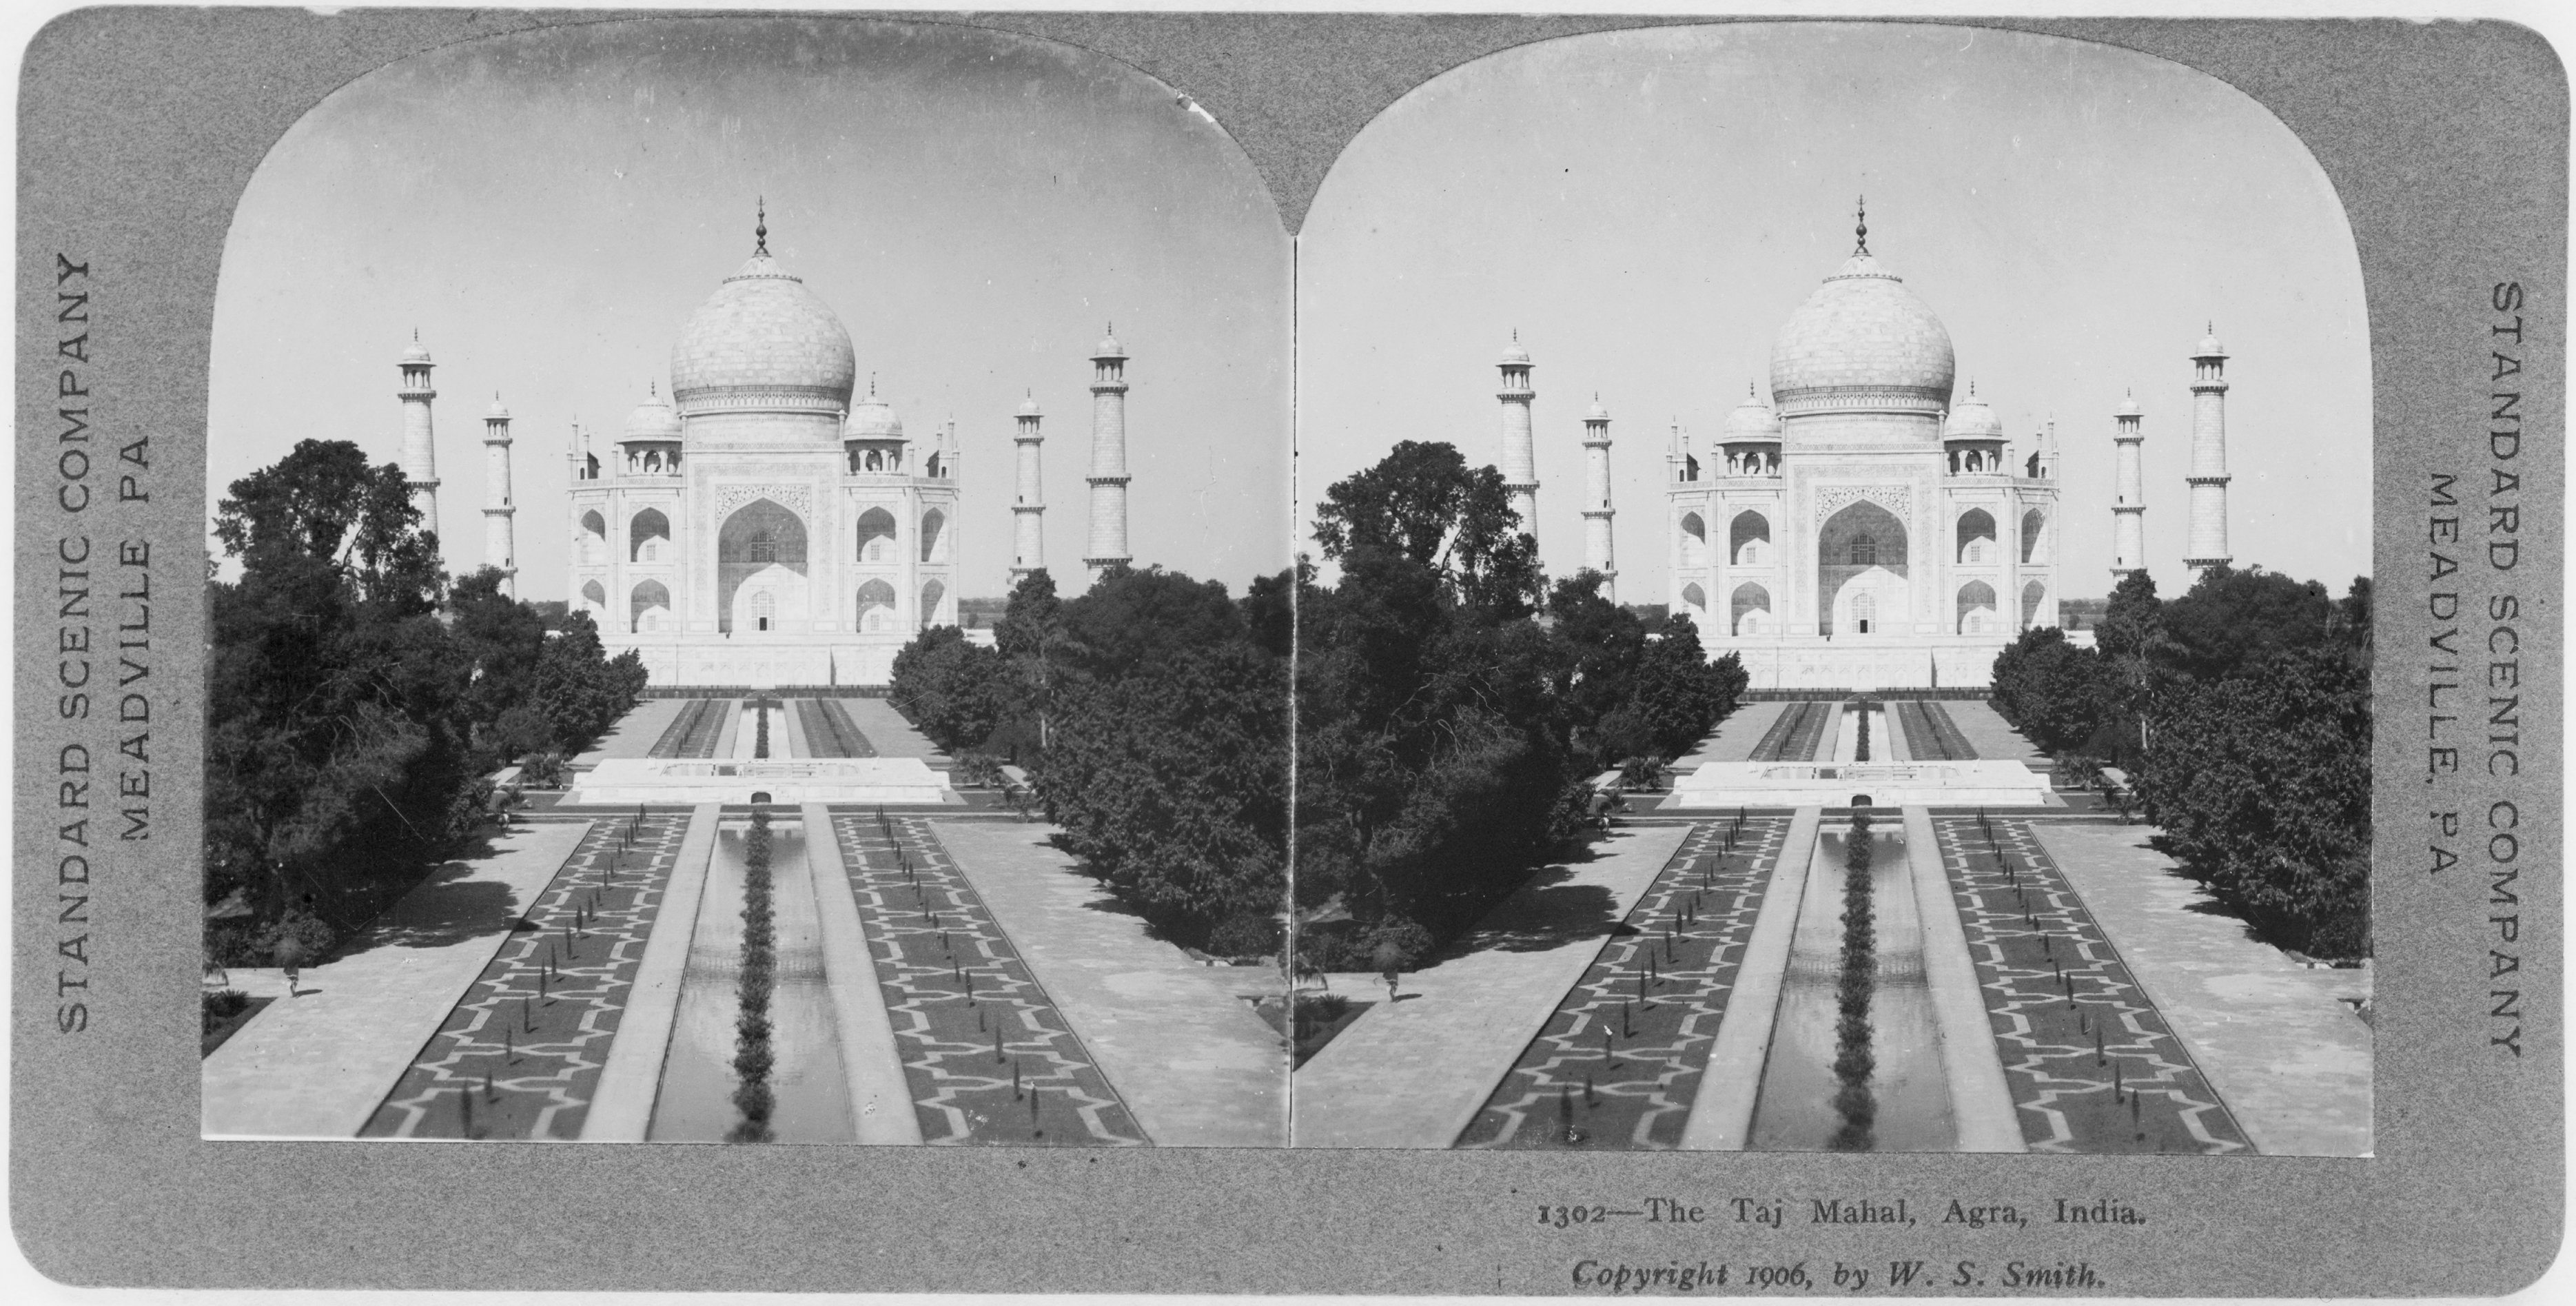 Taj Mahal Pictures Scenic Travel Photos: India Is Trying To Block Bangladesh's Copycat Taj Mahal